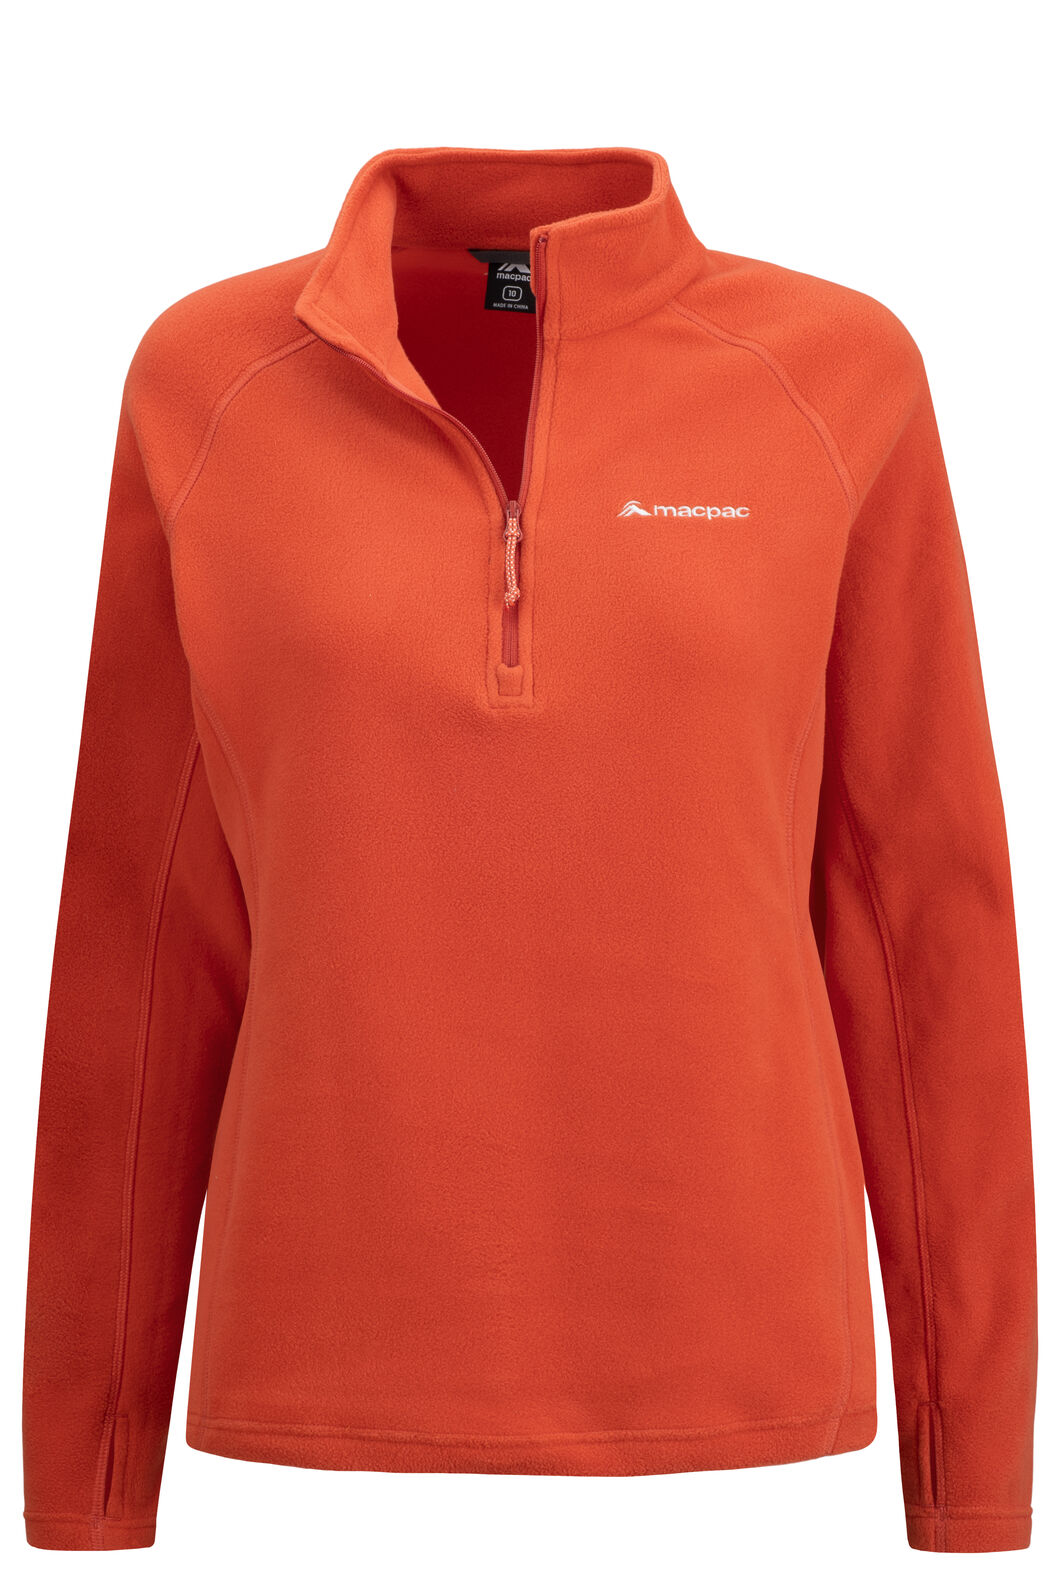 Macpac Tui Polartec® Micro Fleece® Pullover — Women's, Habanero, hi-res